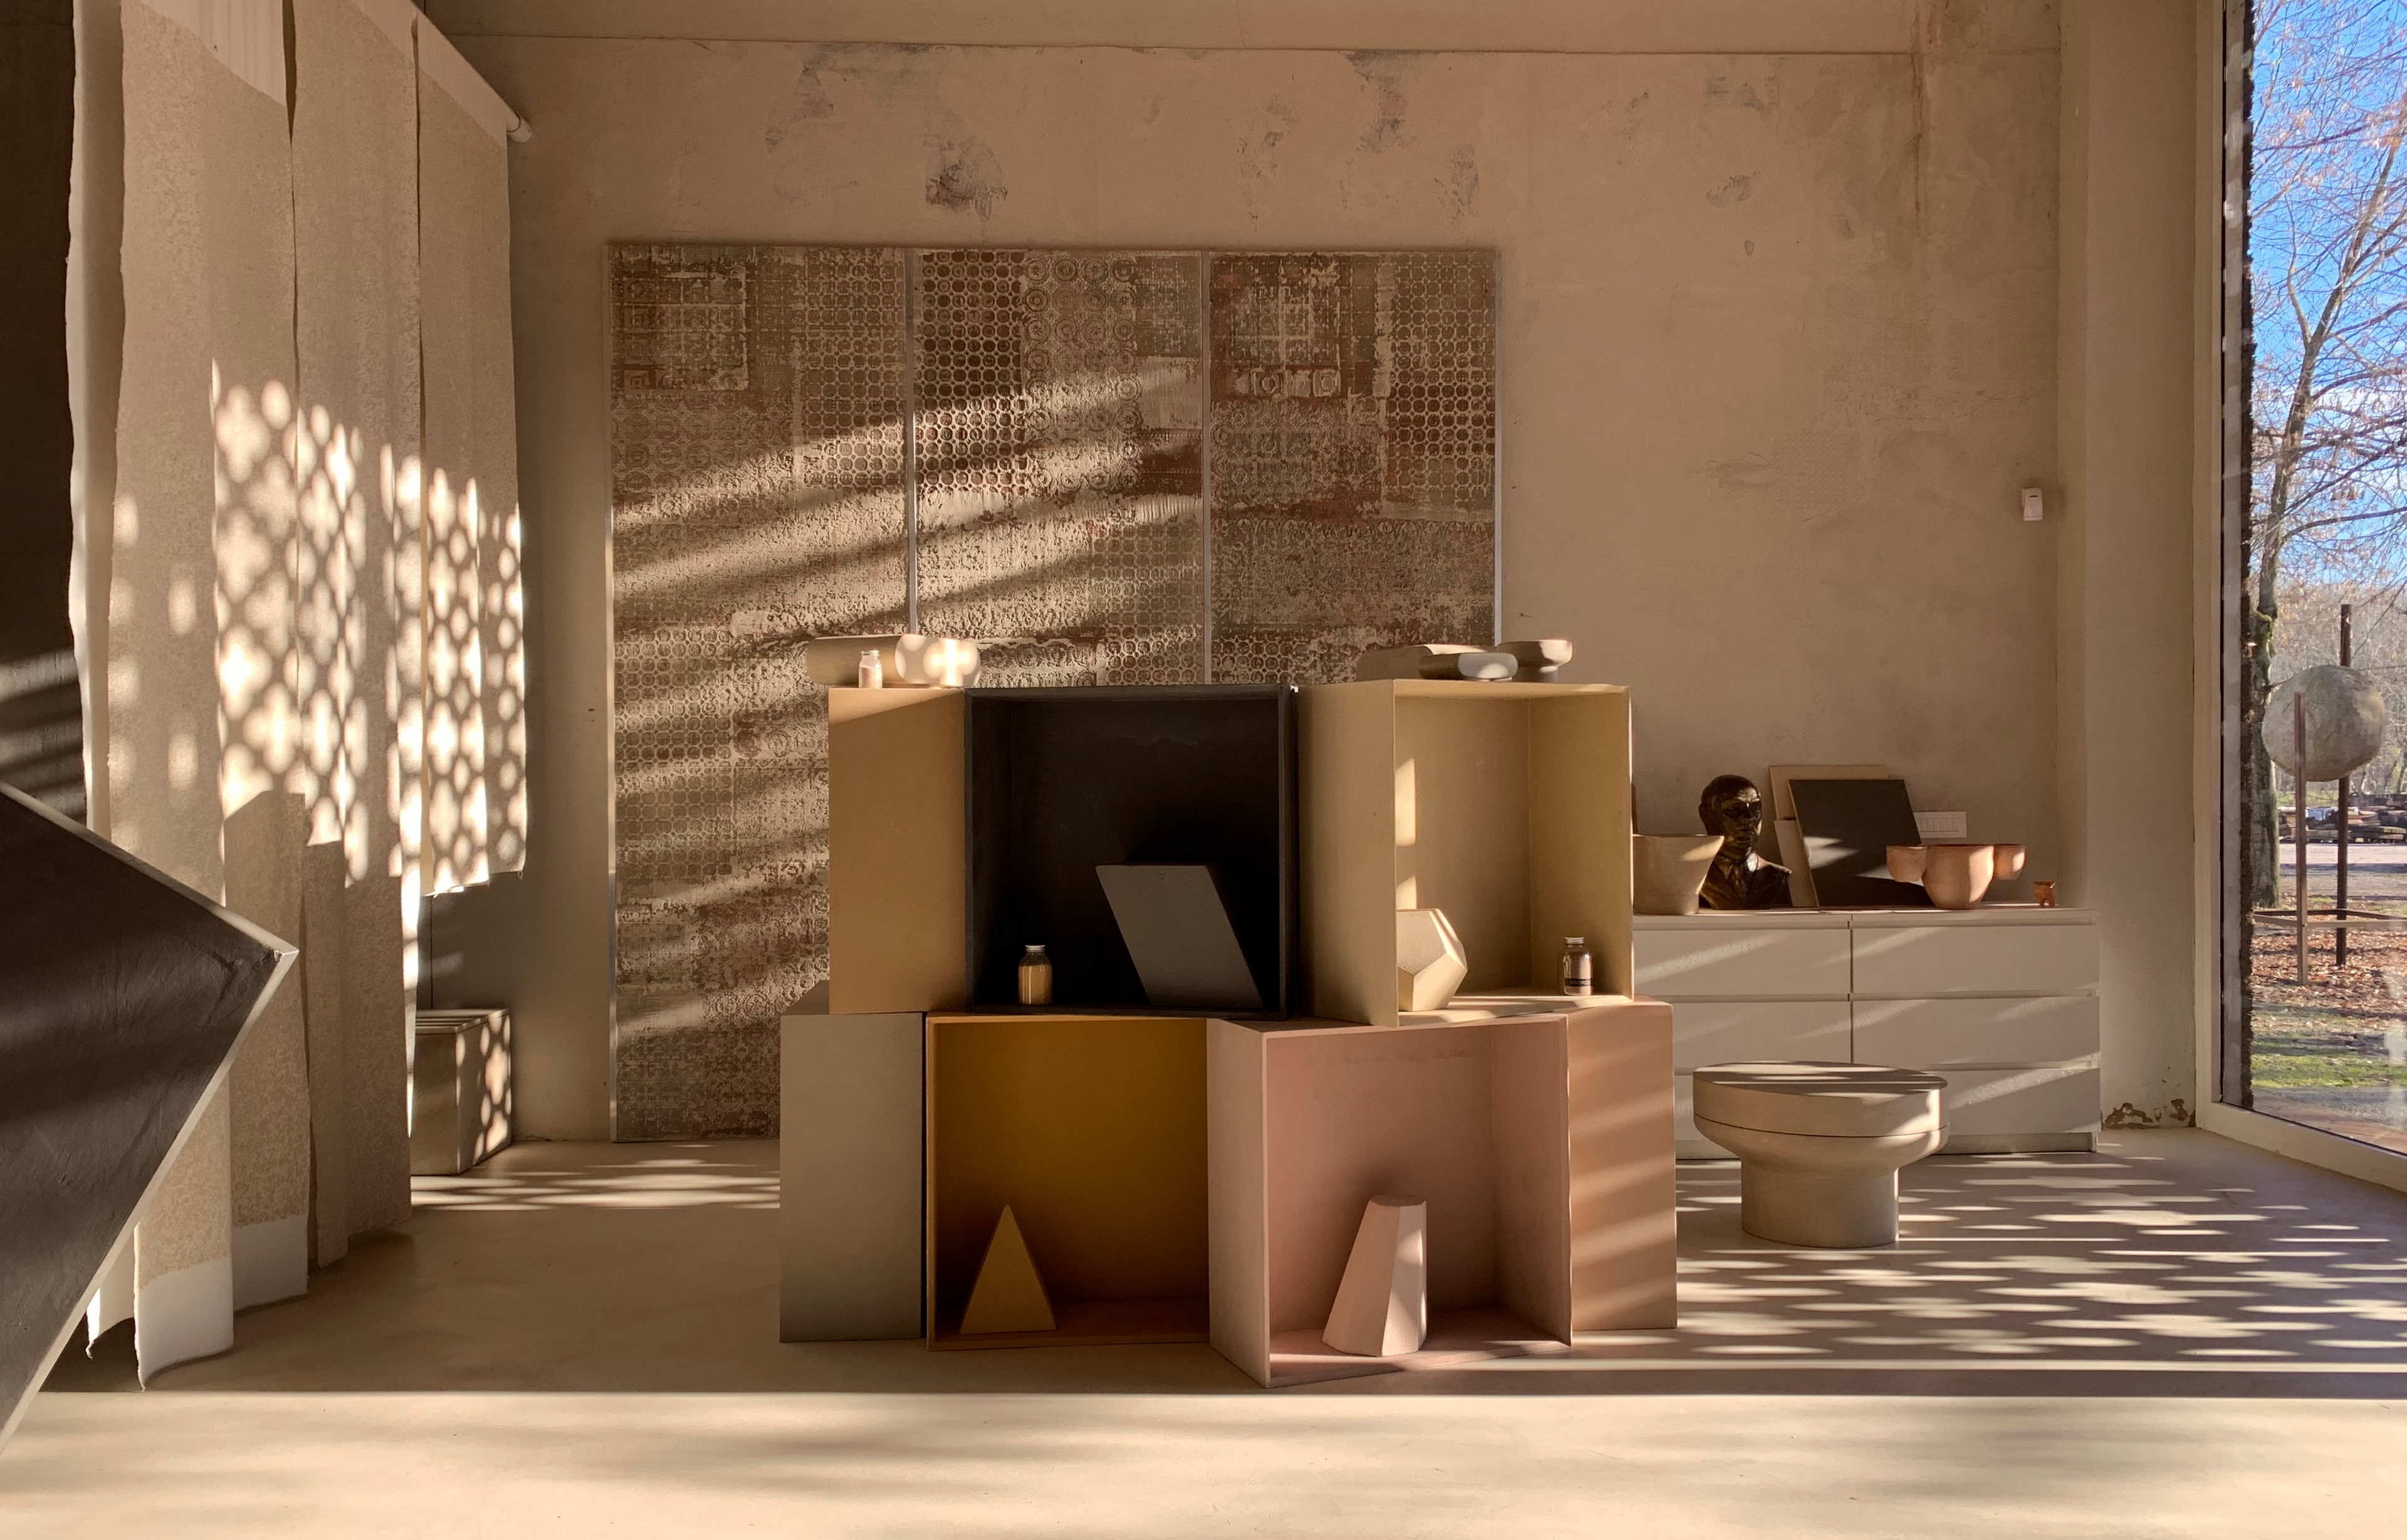 Matteo Brioni headquarter showroom in Ganzaga, Mantua, by Giovanni Bergamaschi, photo by Matteo Brioni